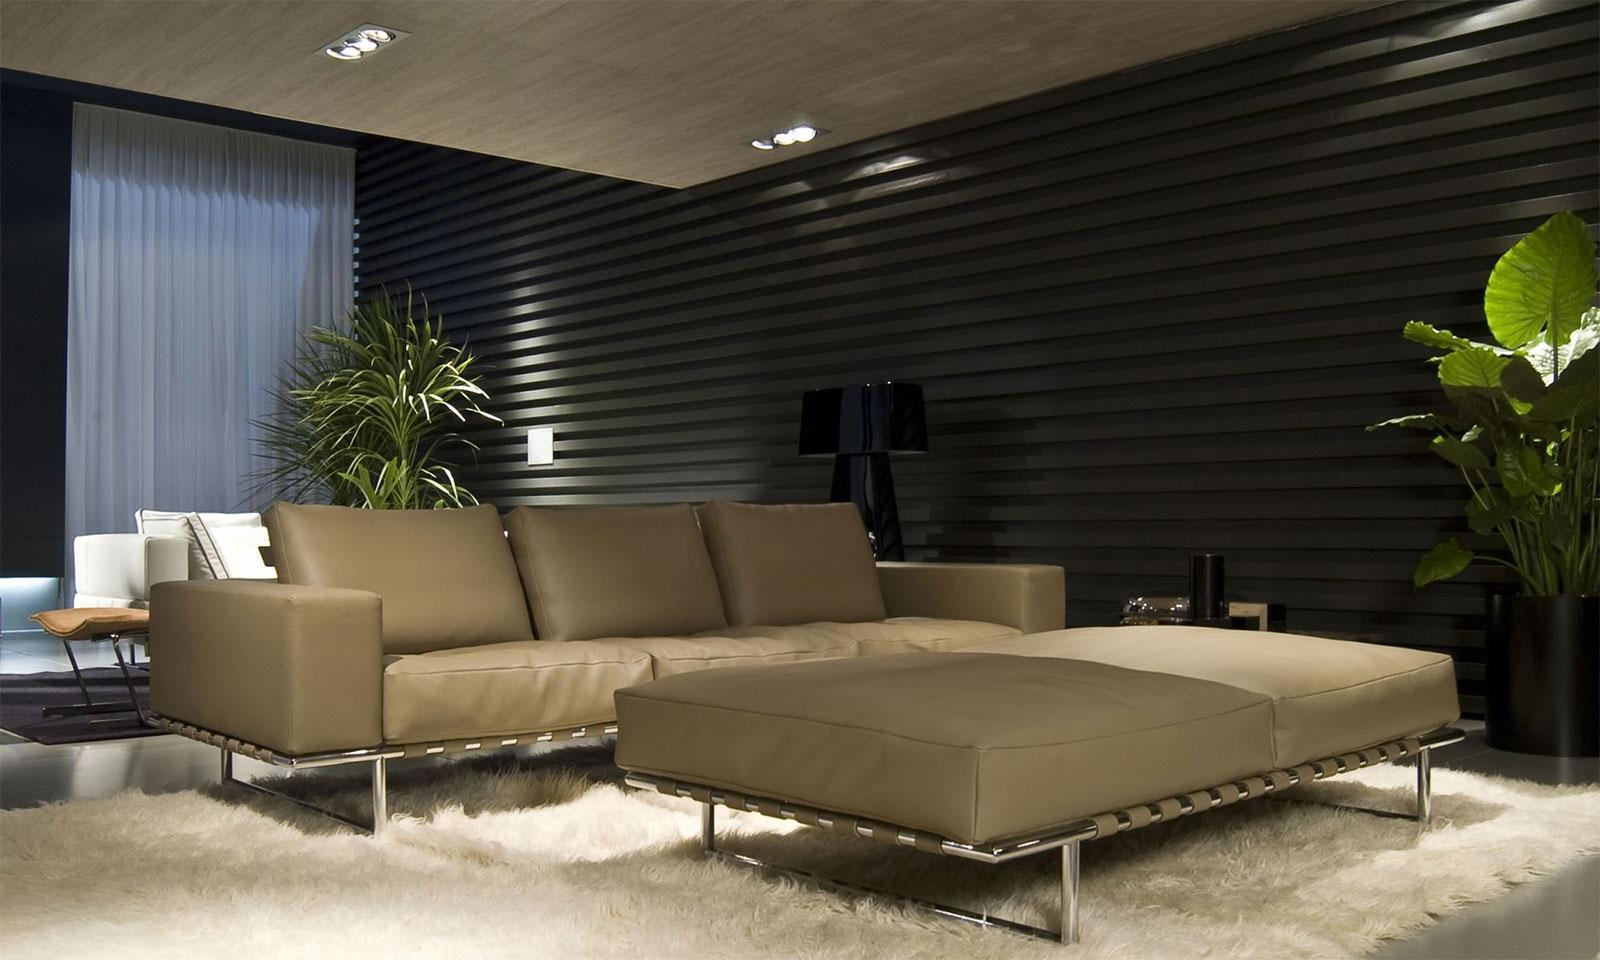 Kristall 270 divano in pelle - Italy Dream Design